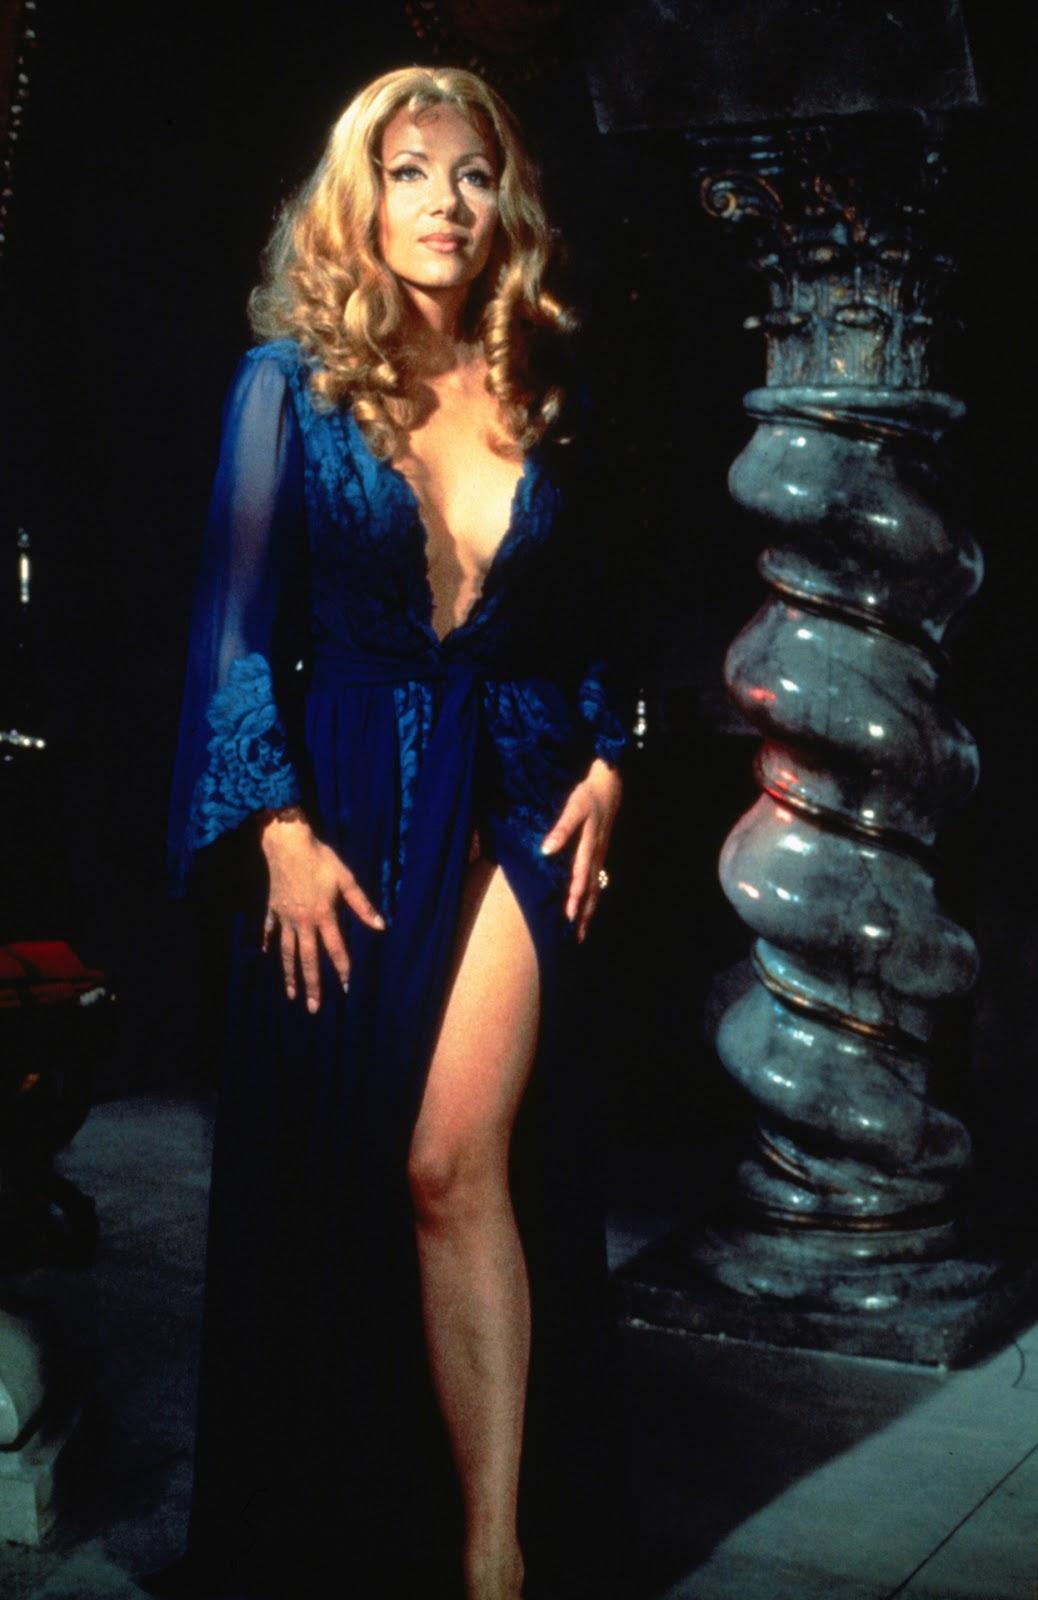 Ingrid Pitt as Countess Elisabeth Nodosheen in Countess Dracula